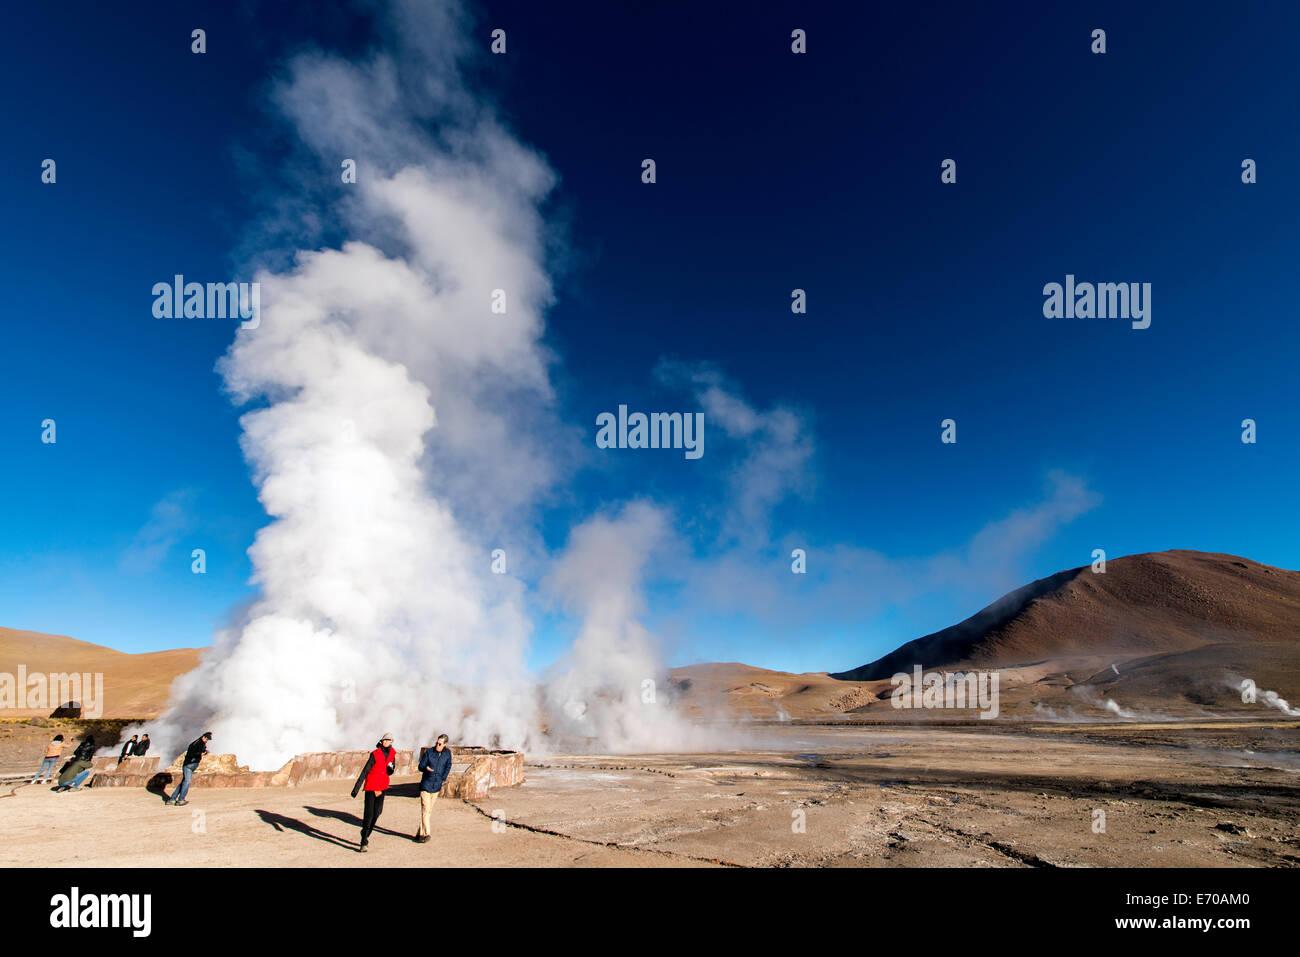 People walking across Tatio Geysers Geothermal fields San Pedro de Atacama Chile South America - Stock Image